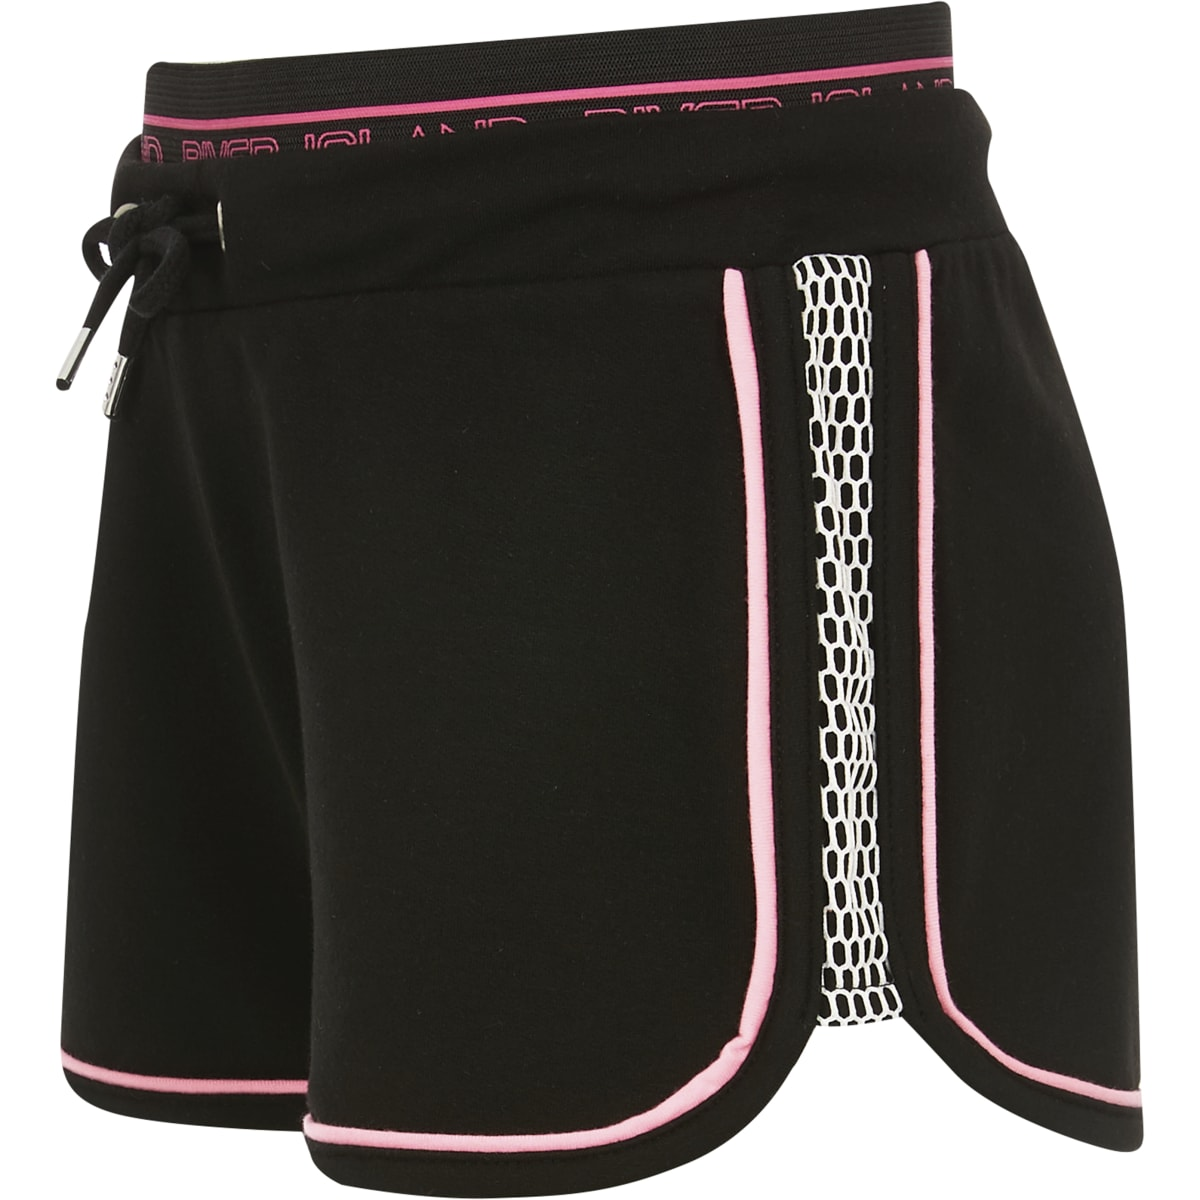 Girls black neon mesh shorts